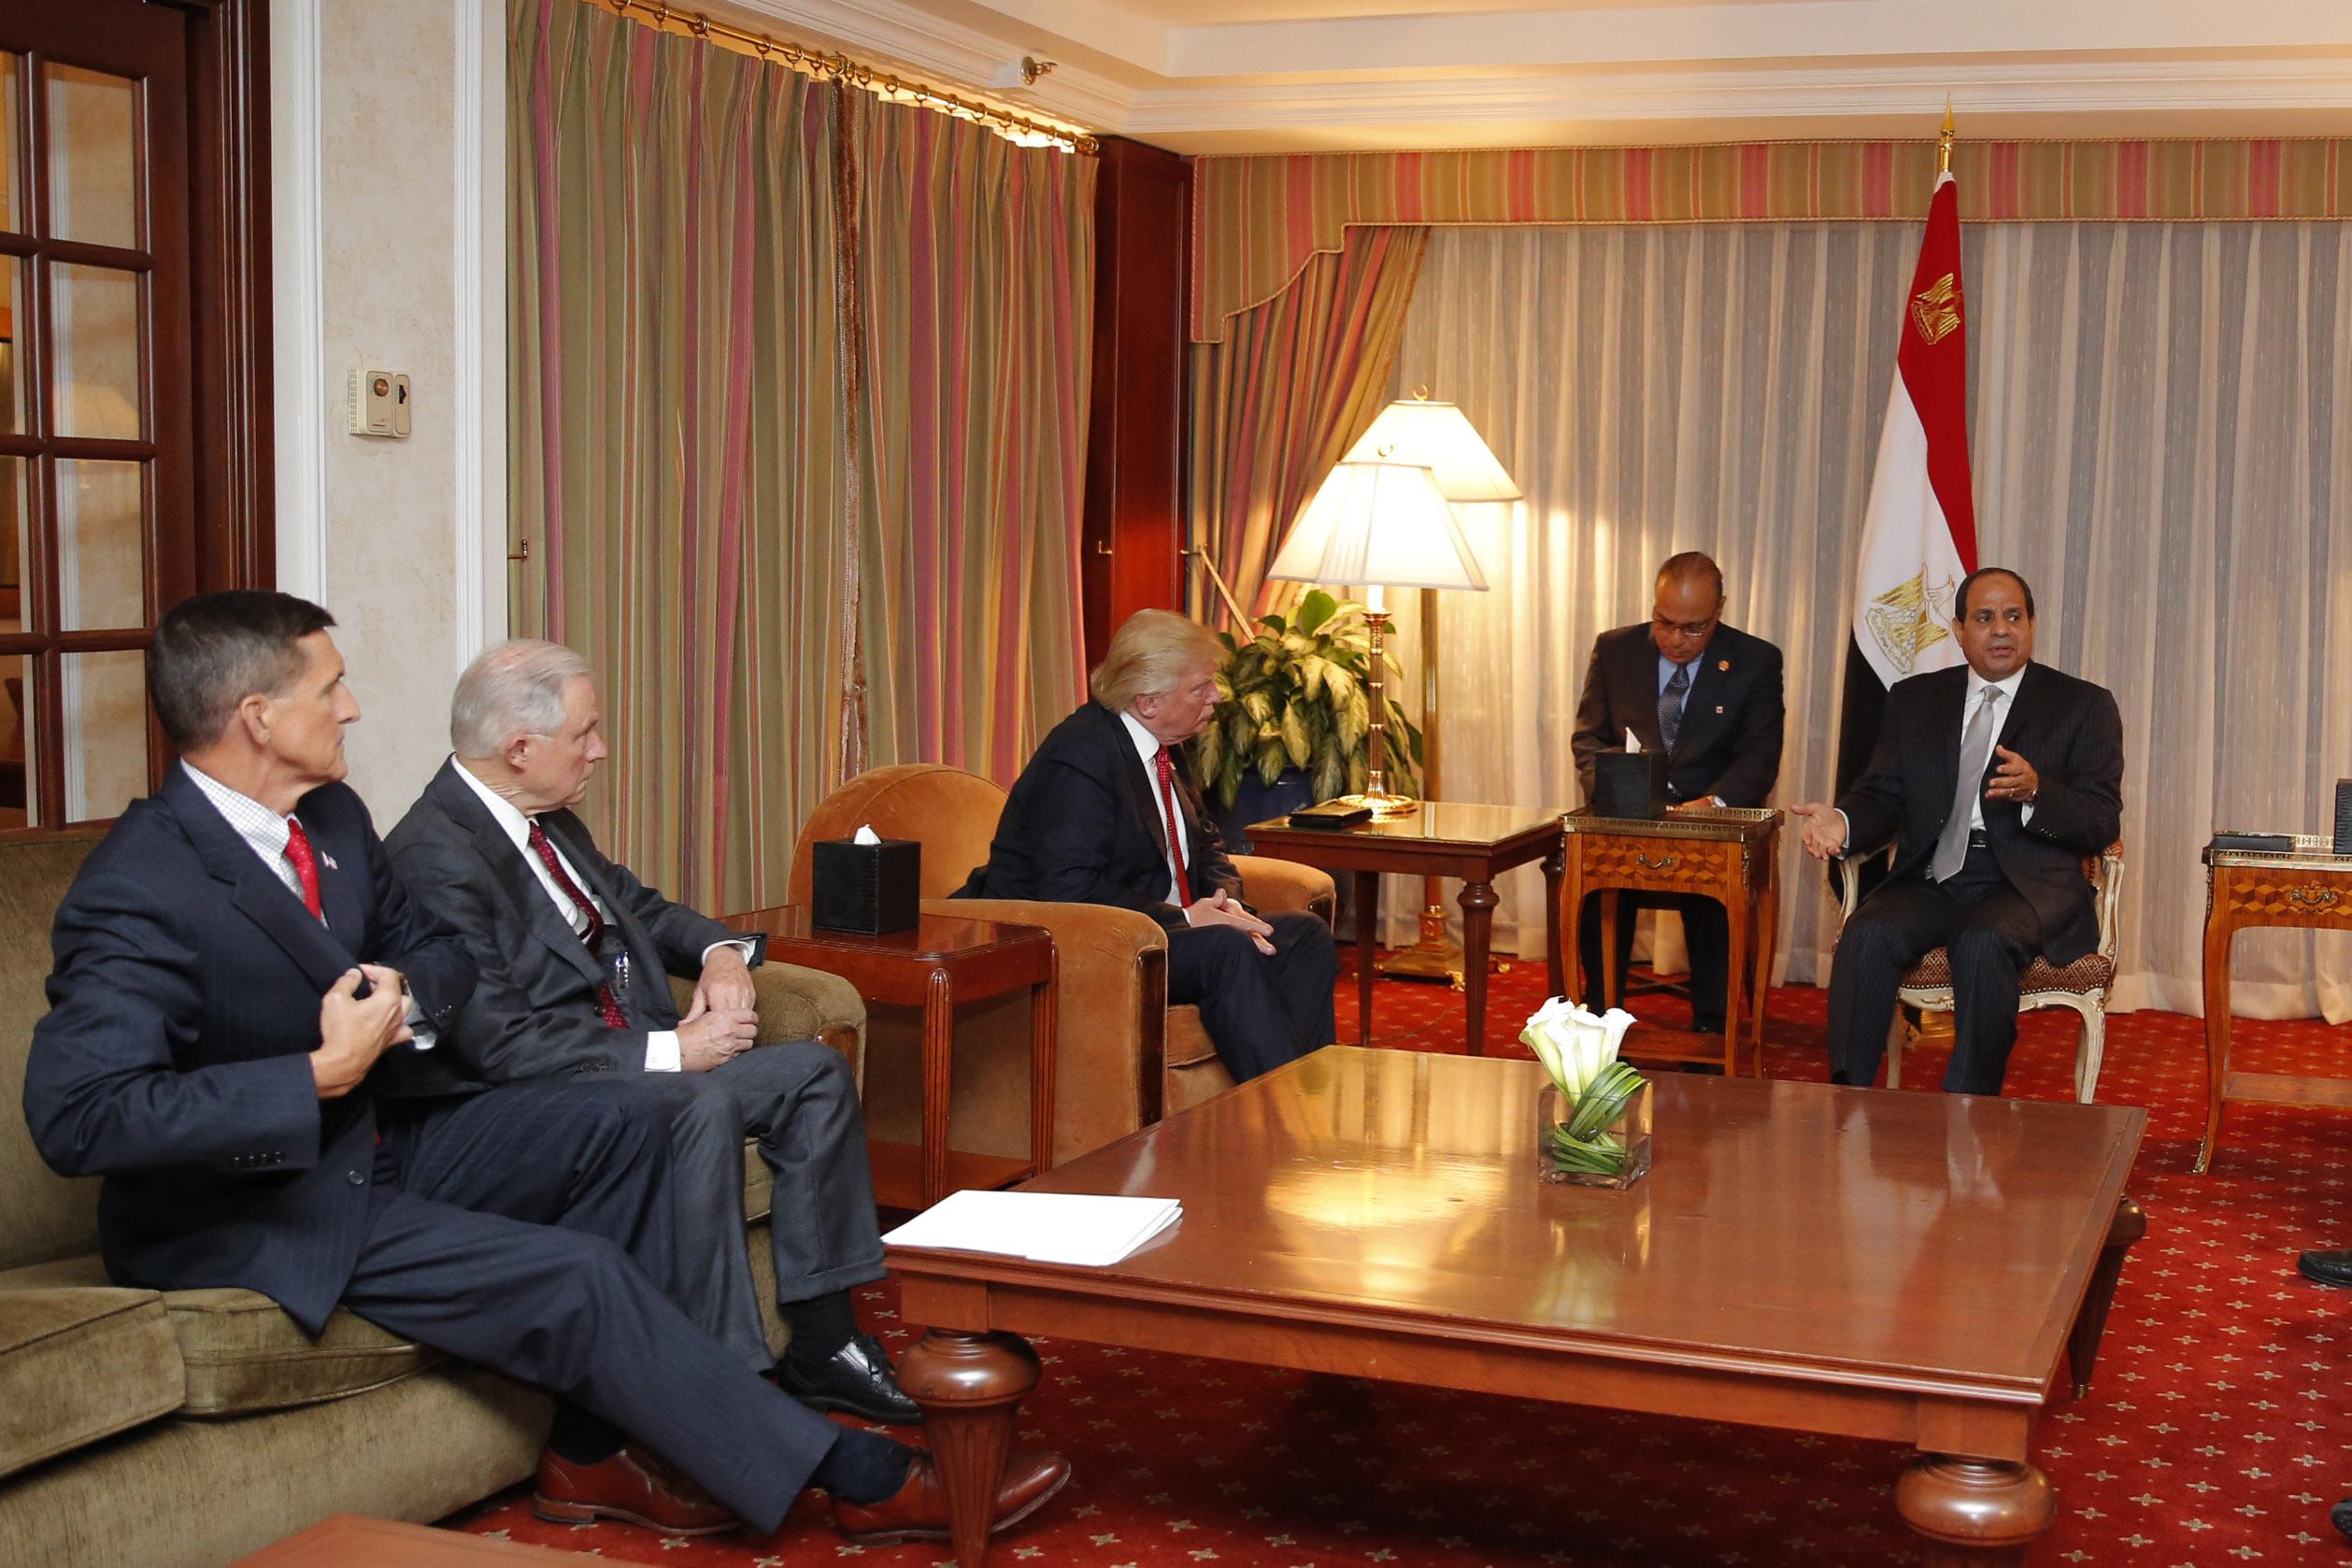 US-EGYPT-POLITICS-VOTE-REPUBLICANS-TRUMP